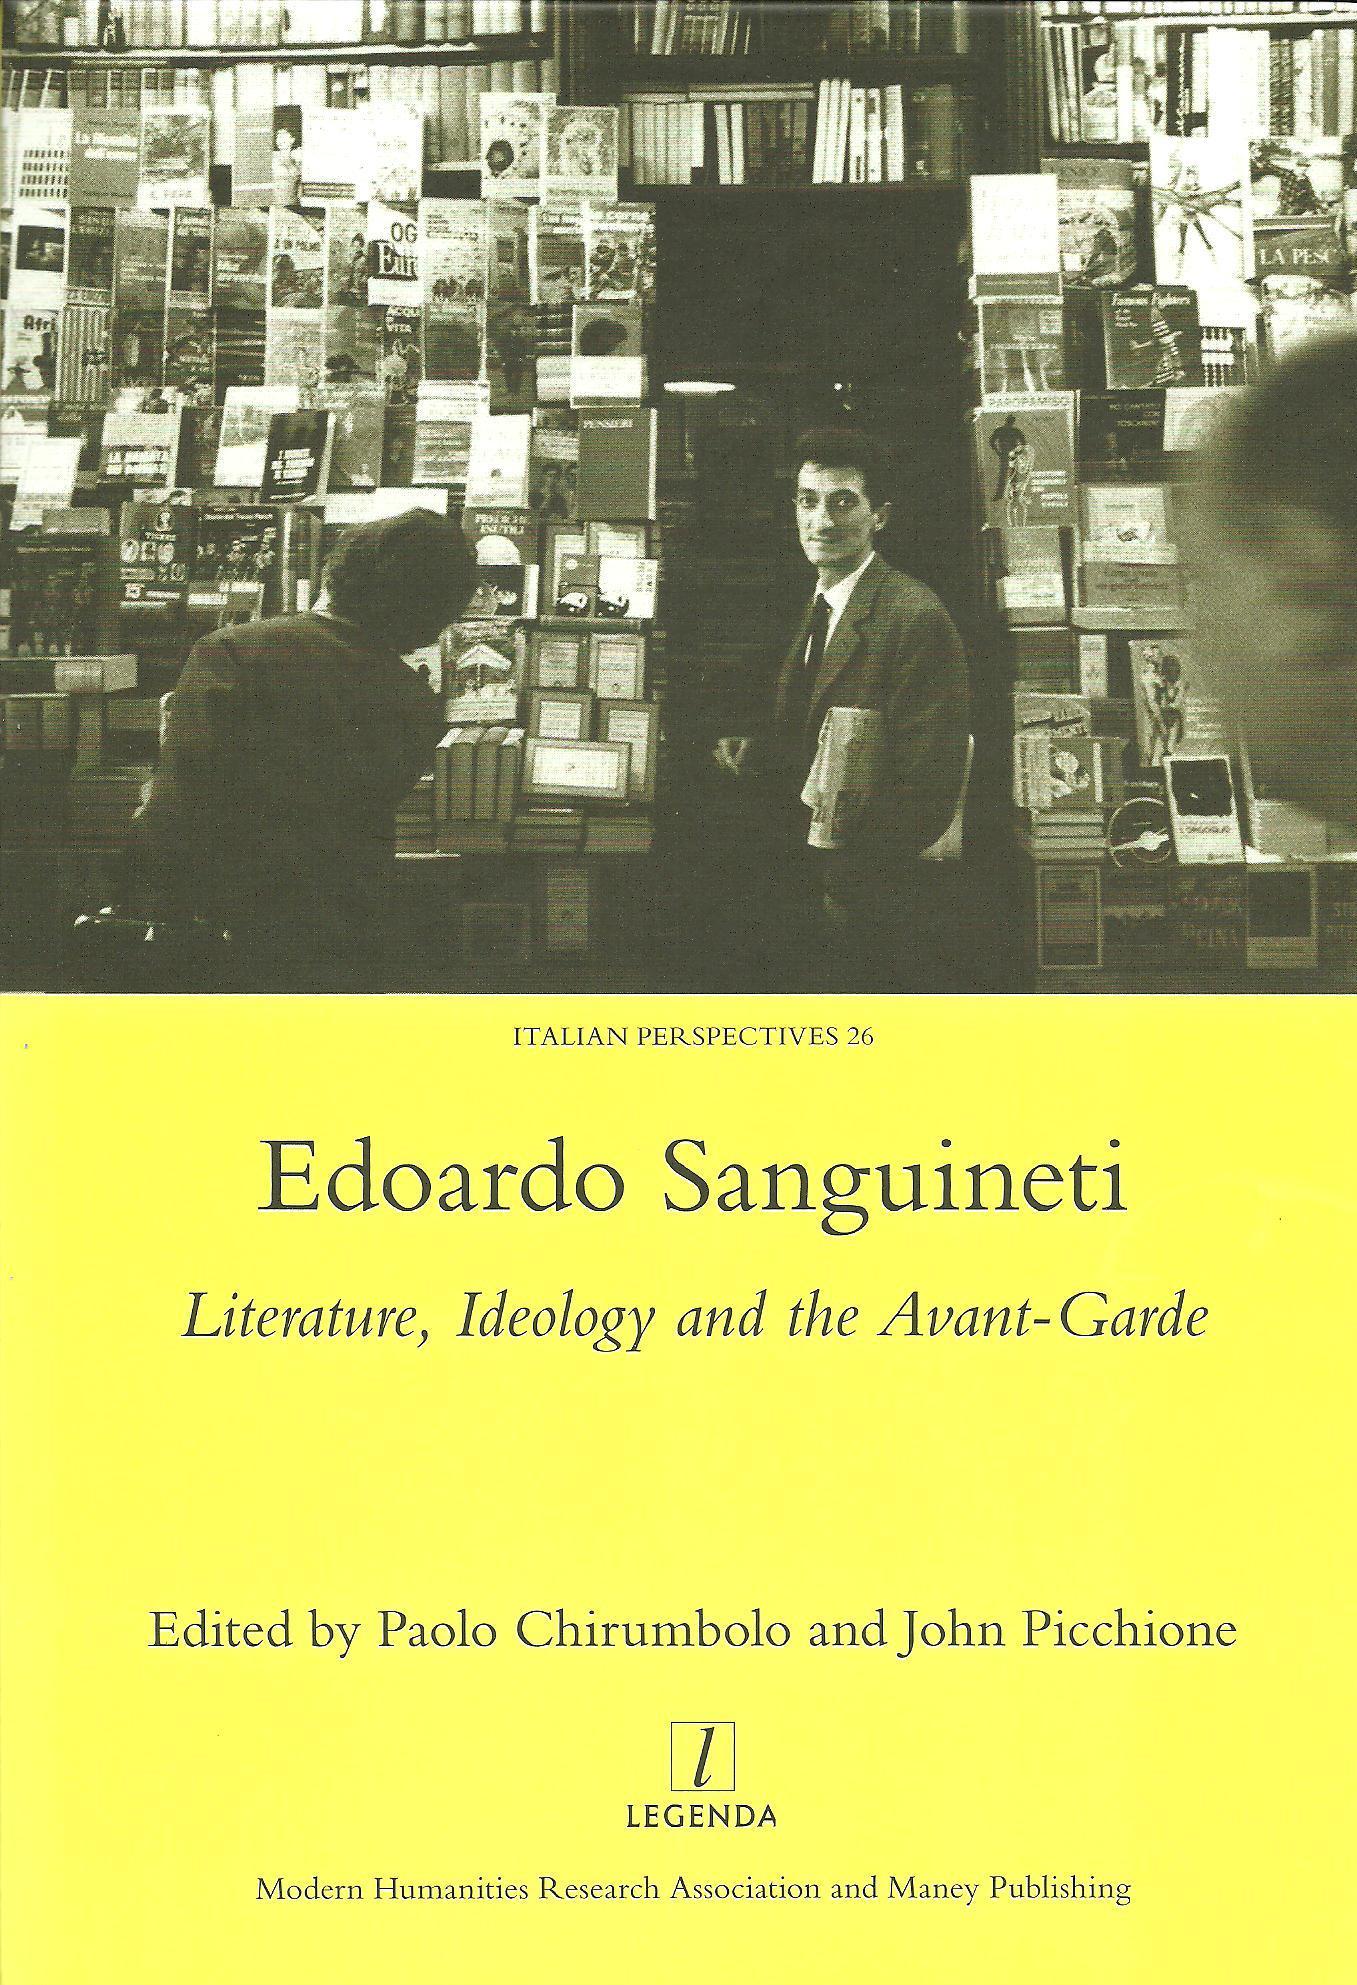 Edoardo Sanguineti